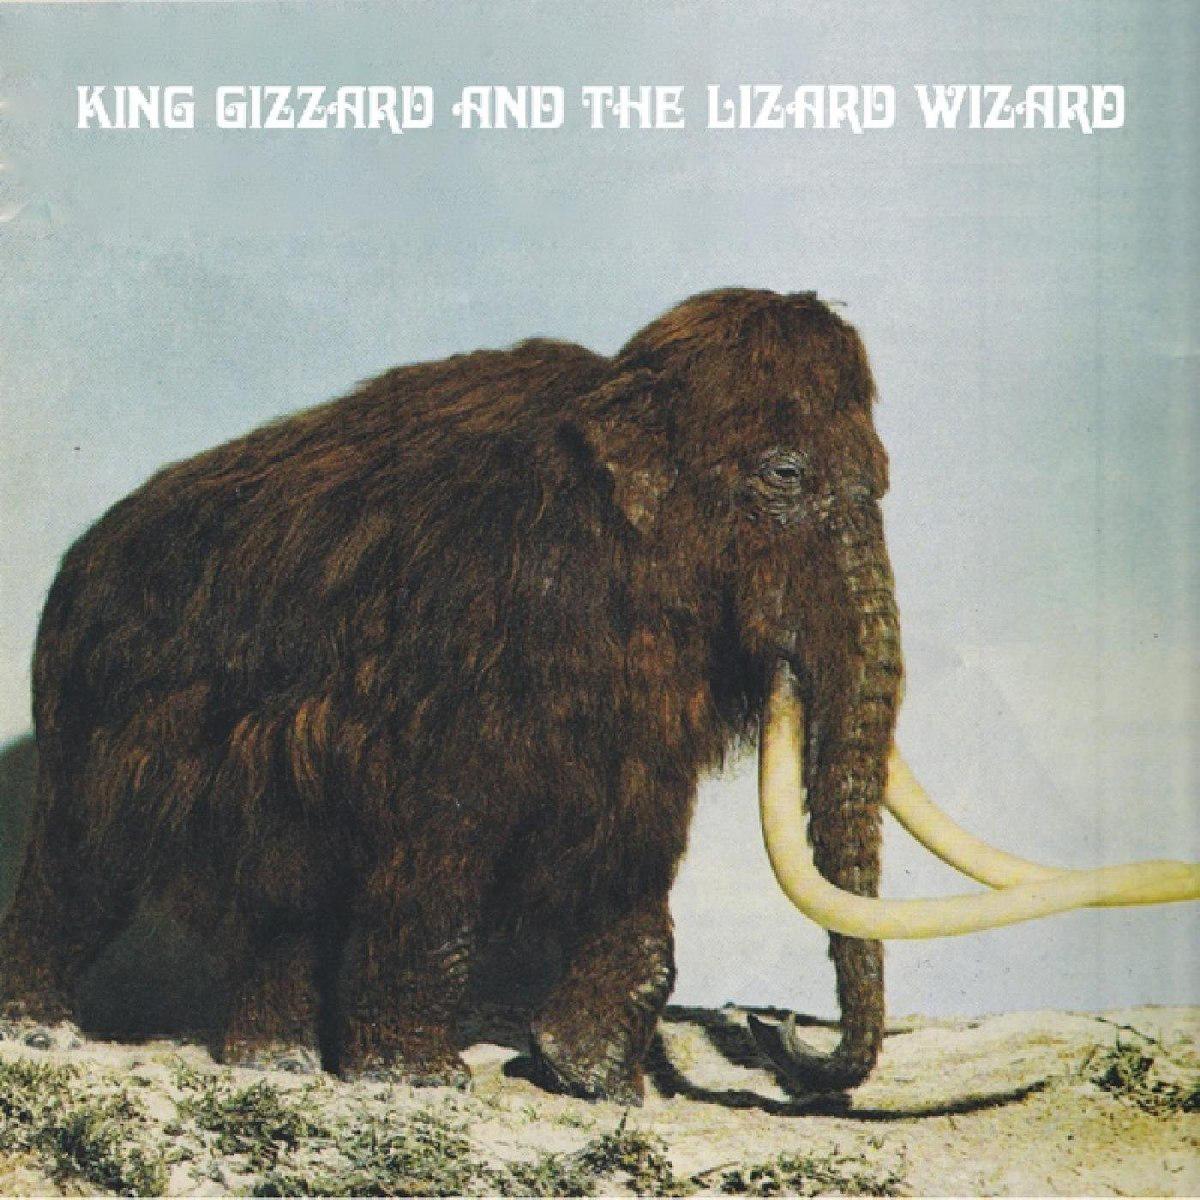 King Gizzard And The Lizard Wizard King Gizzard And The Lizard Wizard. Polygondwanaland. Fuzz Club Version автокресло gb idan lizard khaki